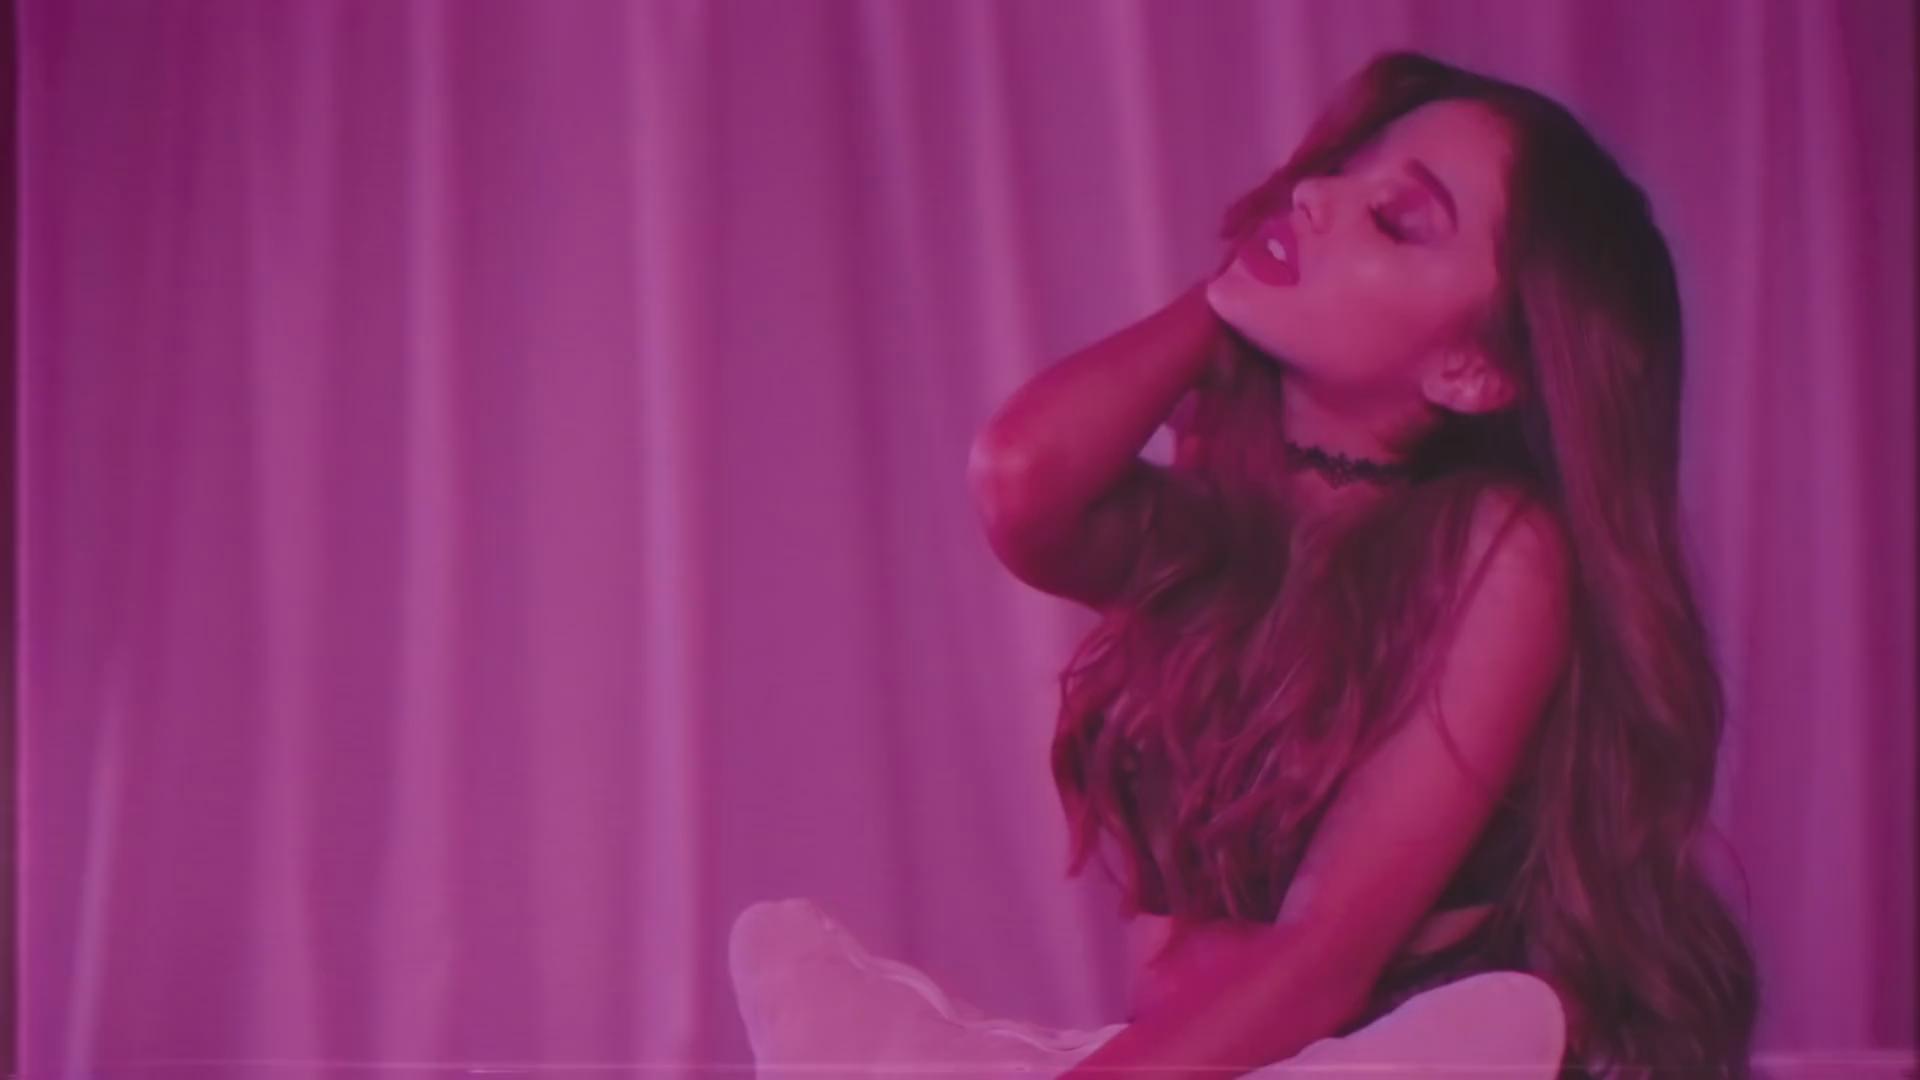 Ariana Grande Photo 329 Of 485 Pics, Wallpaper